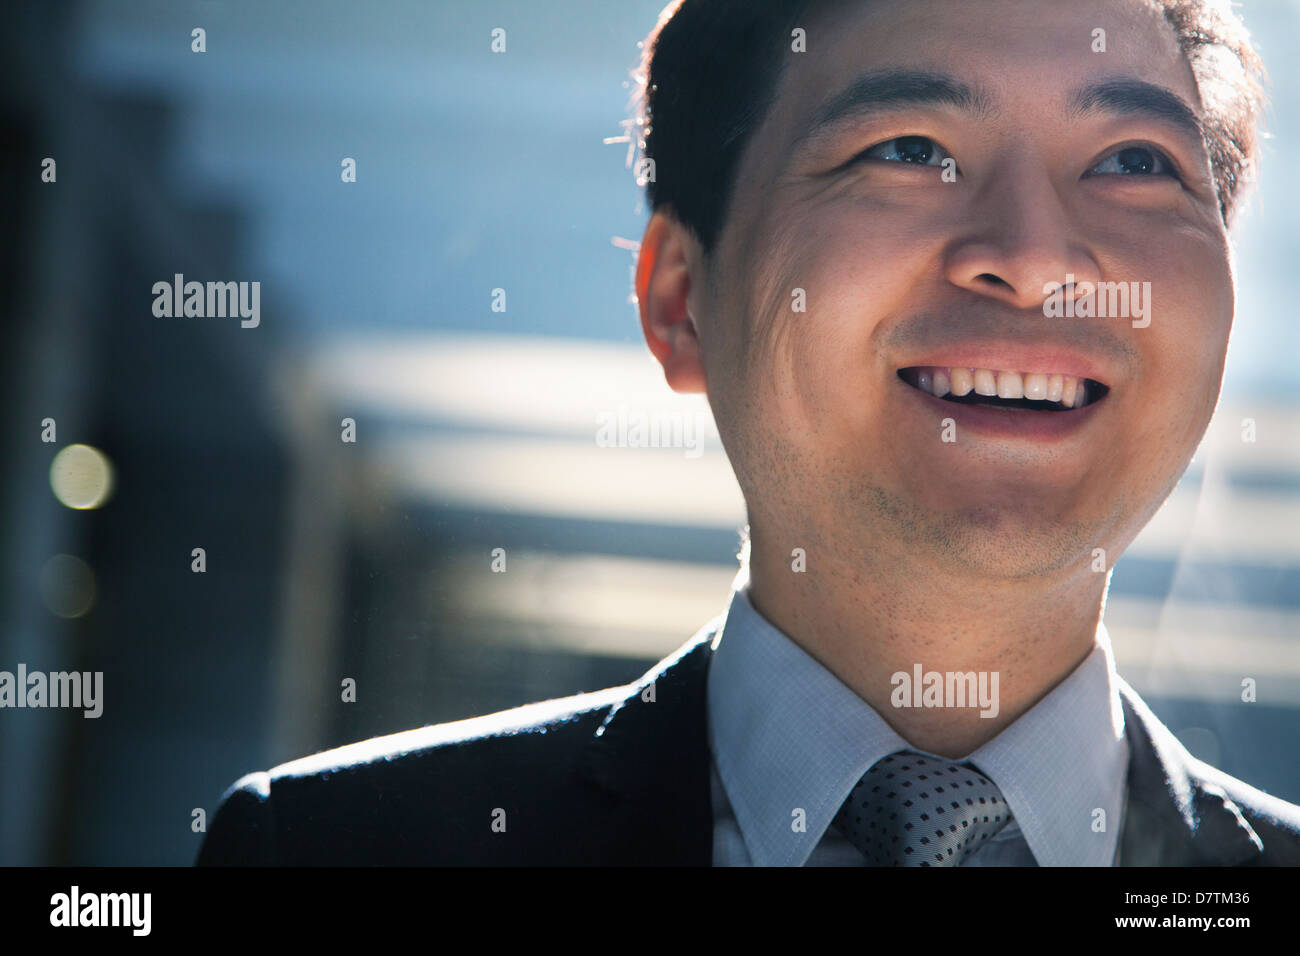 Portrait of smiling businessman in a parking garage - Stock Image